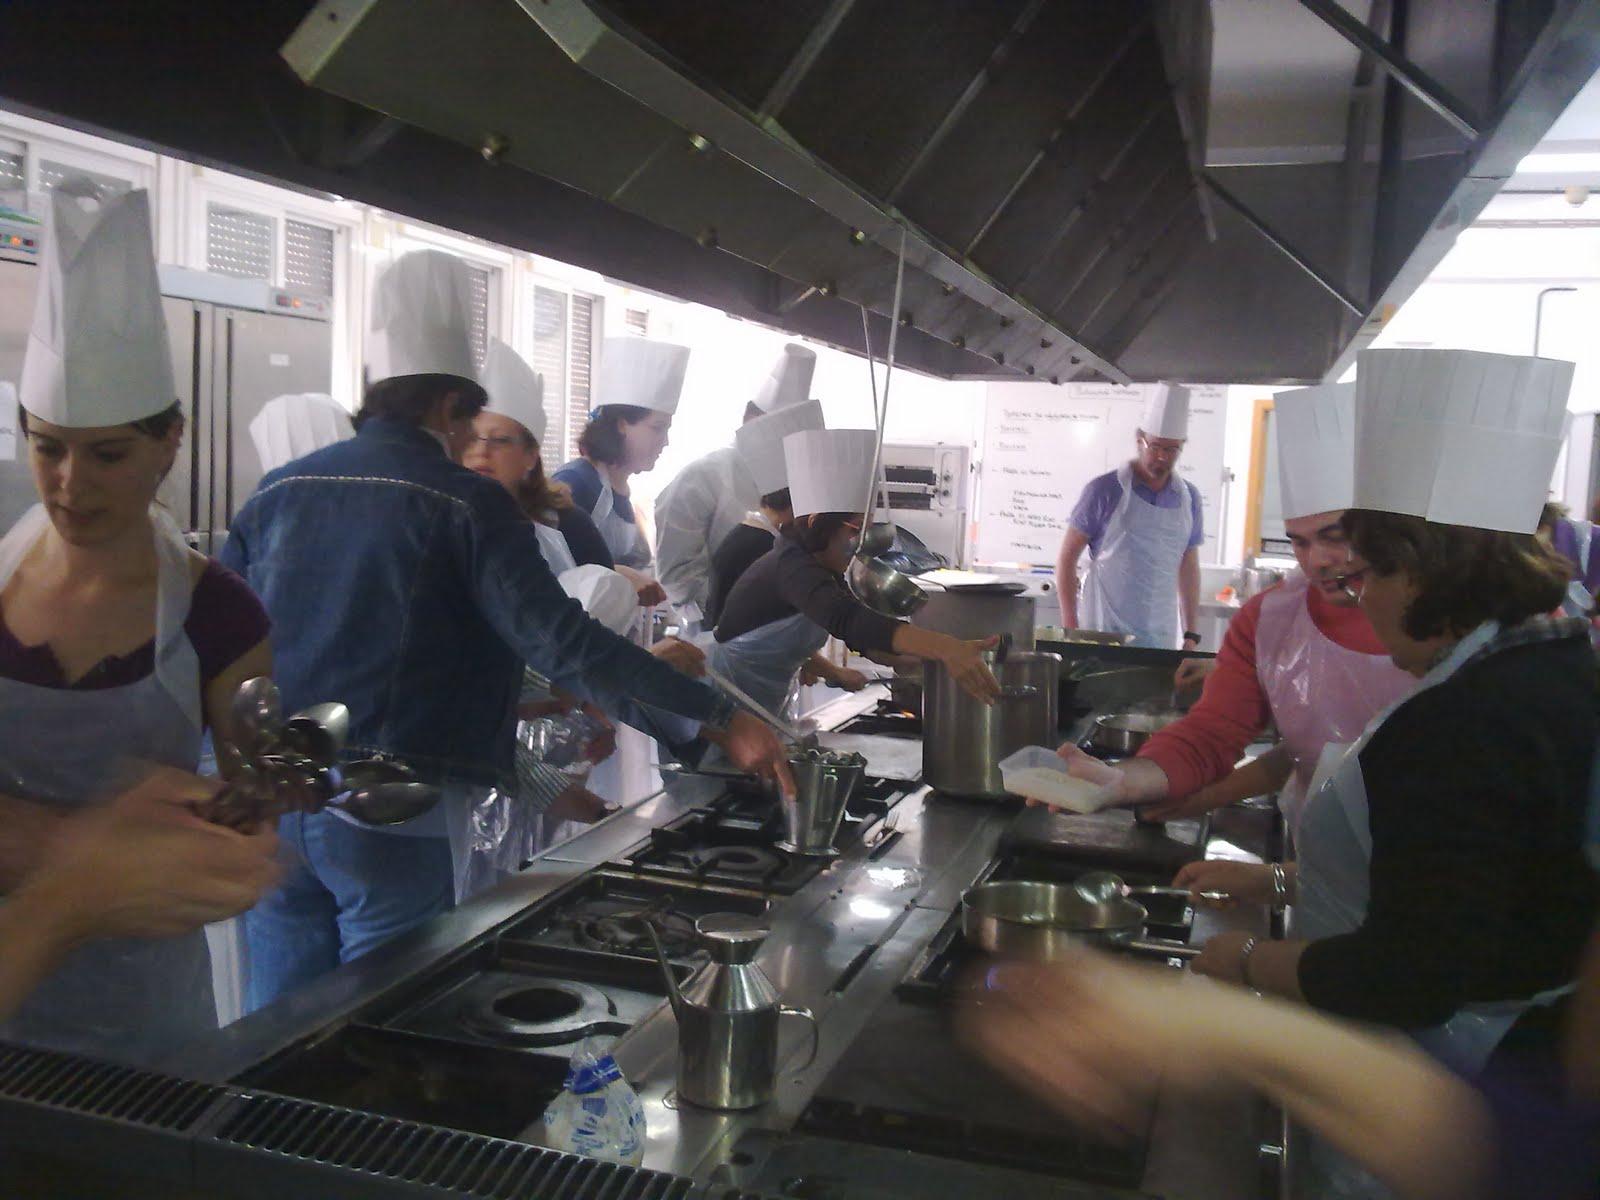 Cocina pluriling ismo e interculturalidad final de curso - Curso de cocina francesa ...